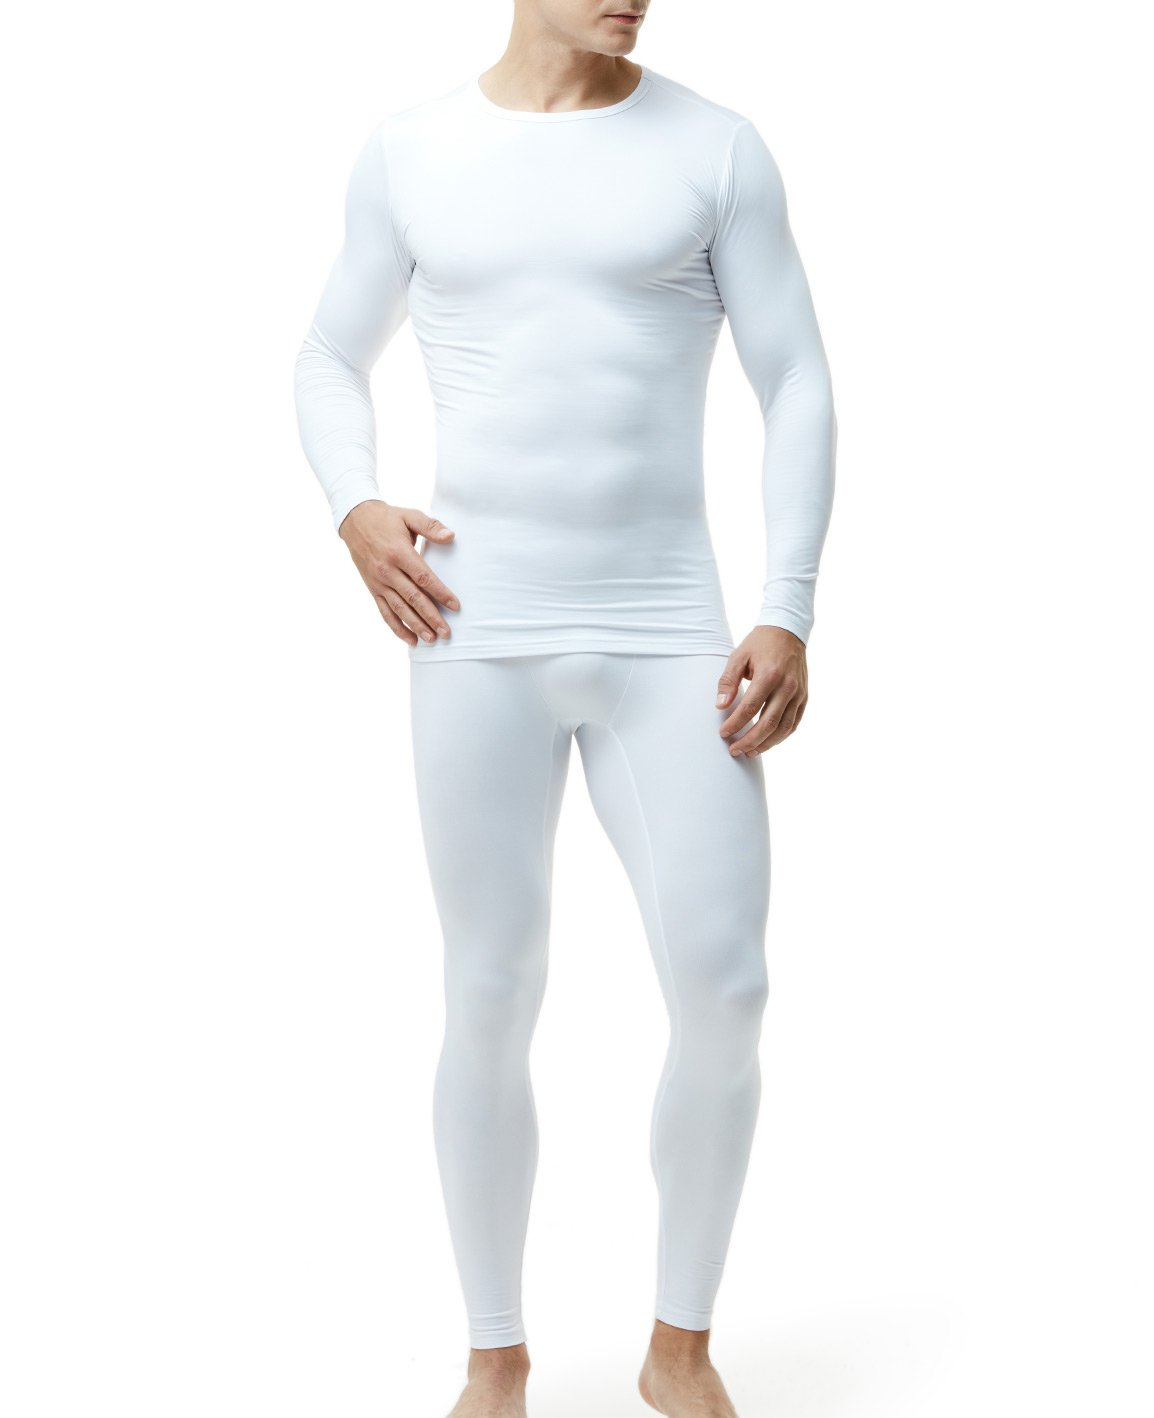 TSLA Blank Men's Microfiber Fleece Lined Top & Bottom Set, Thermal Fleece(mhs100) - White, XX-Large by TSLA